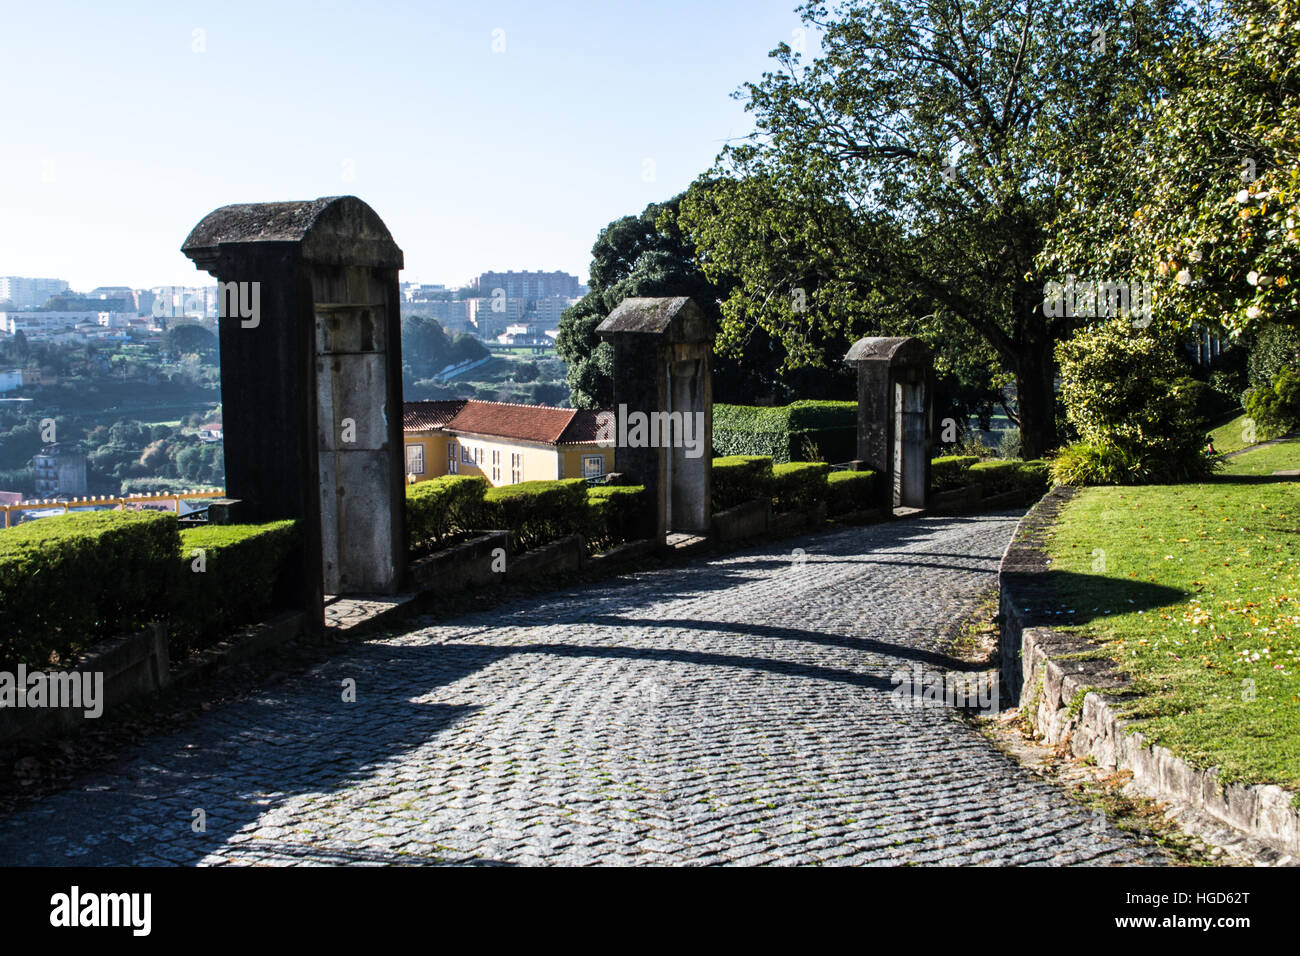 Jardins Do Palacio De Cristal Porto 2020 All You Need